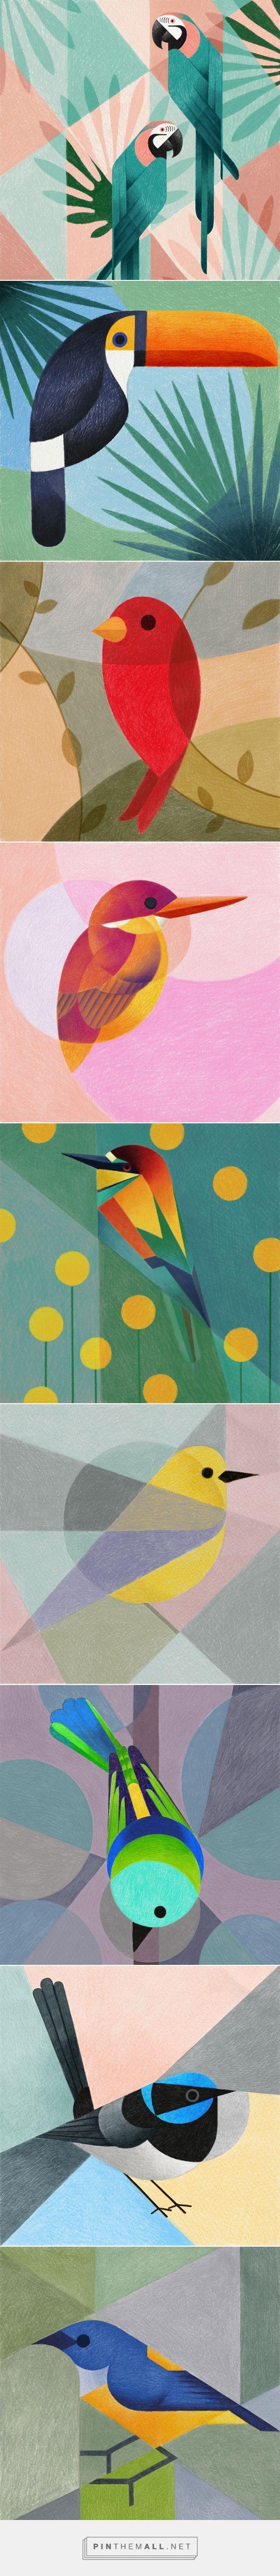 Geometric birds (Procreate-iPad Pro) by Samy Halim #illustration #birds